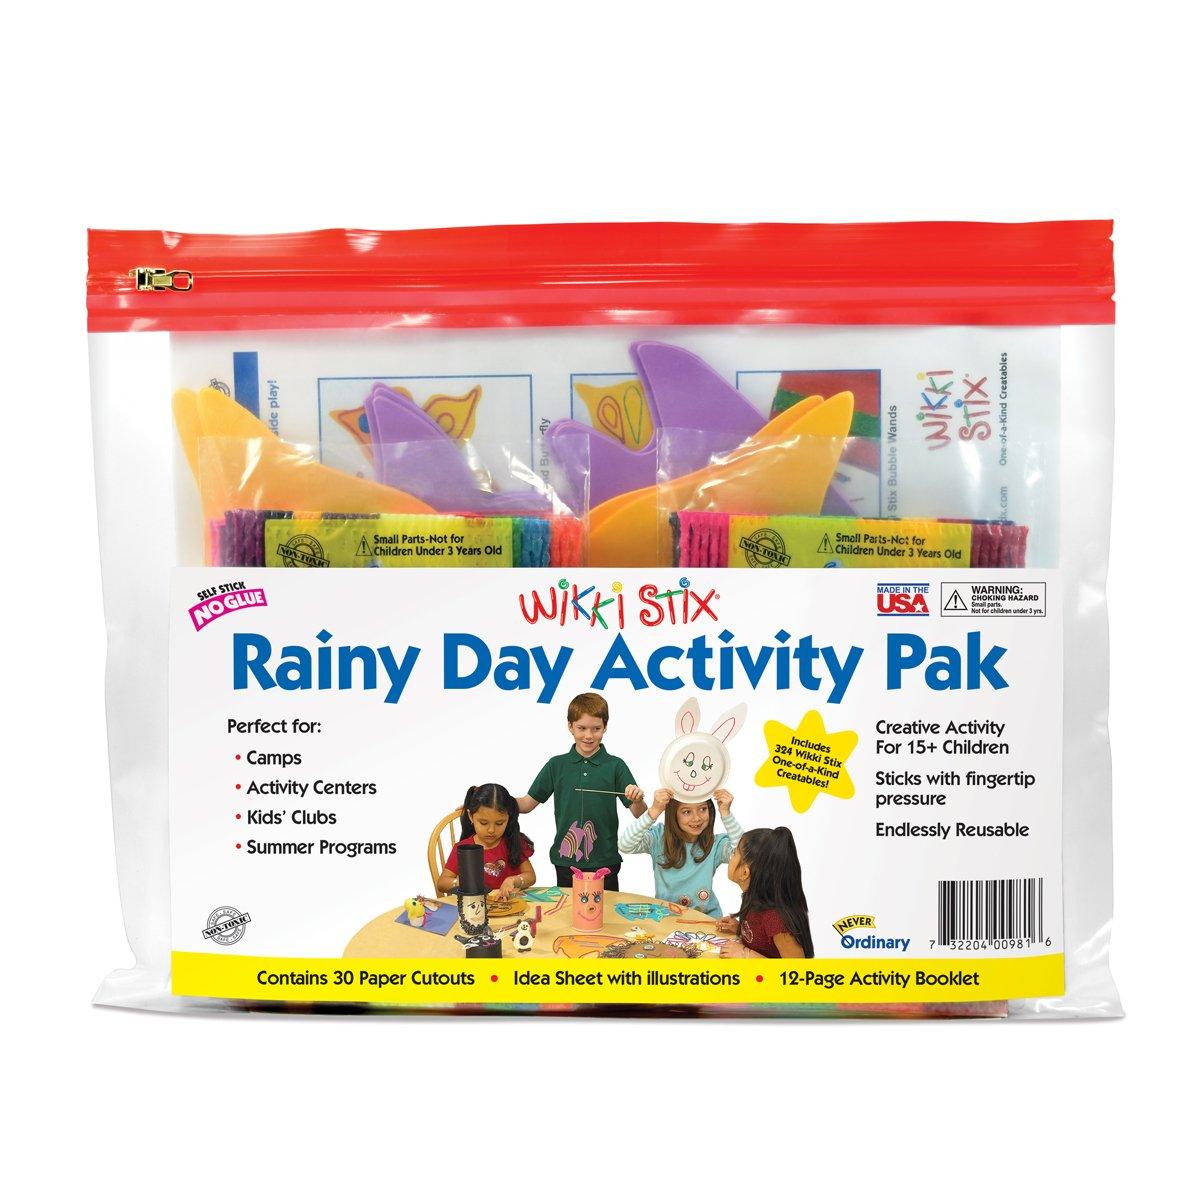 Wikki Stix After School Fun Kit